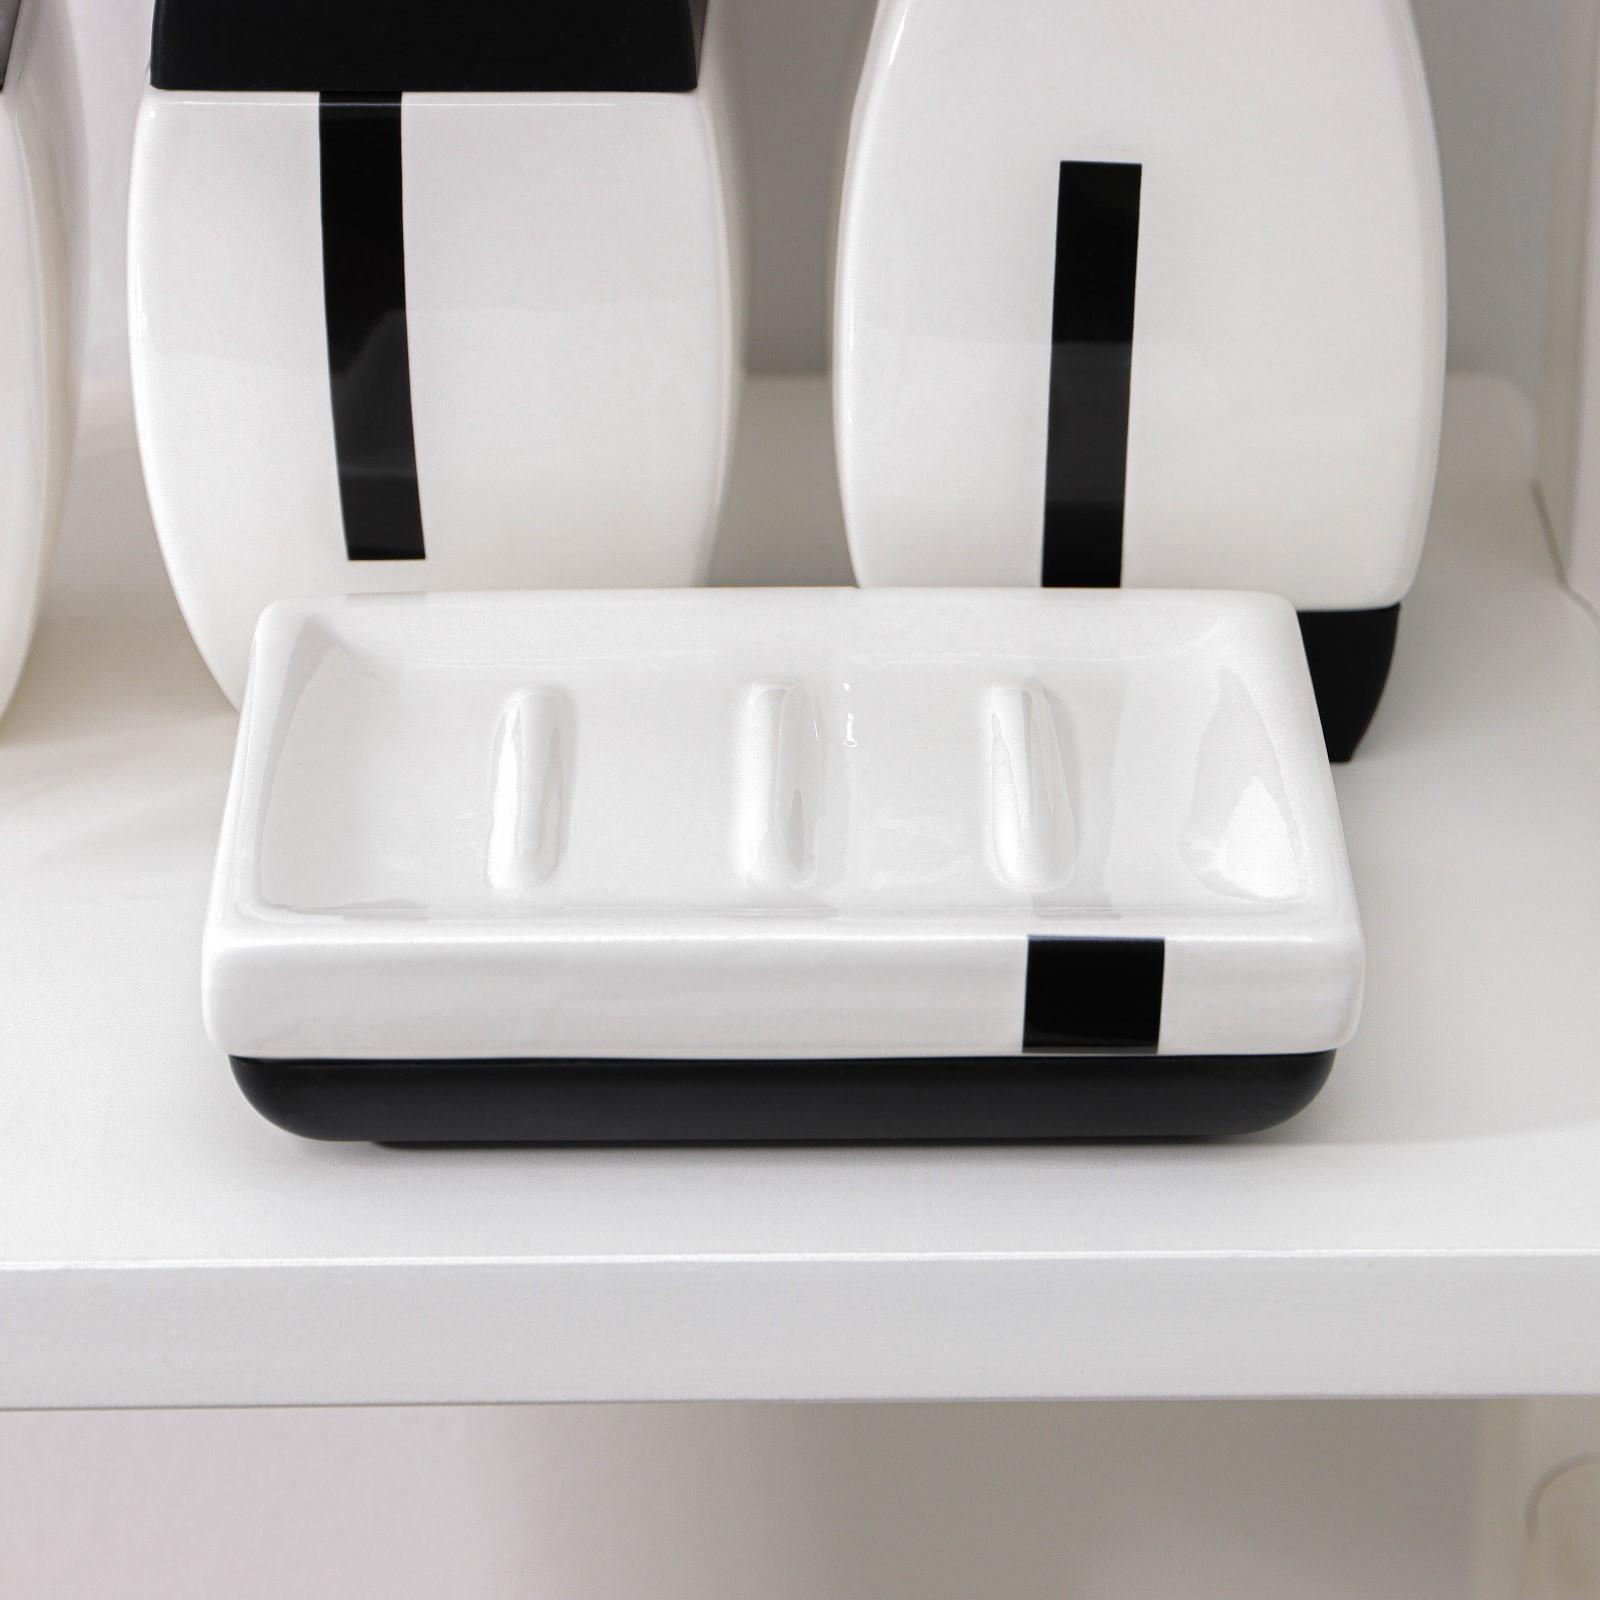 Sima Land, Pea Bathroom Accessories